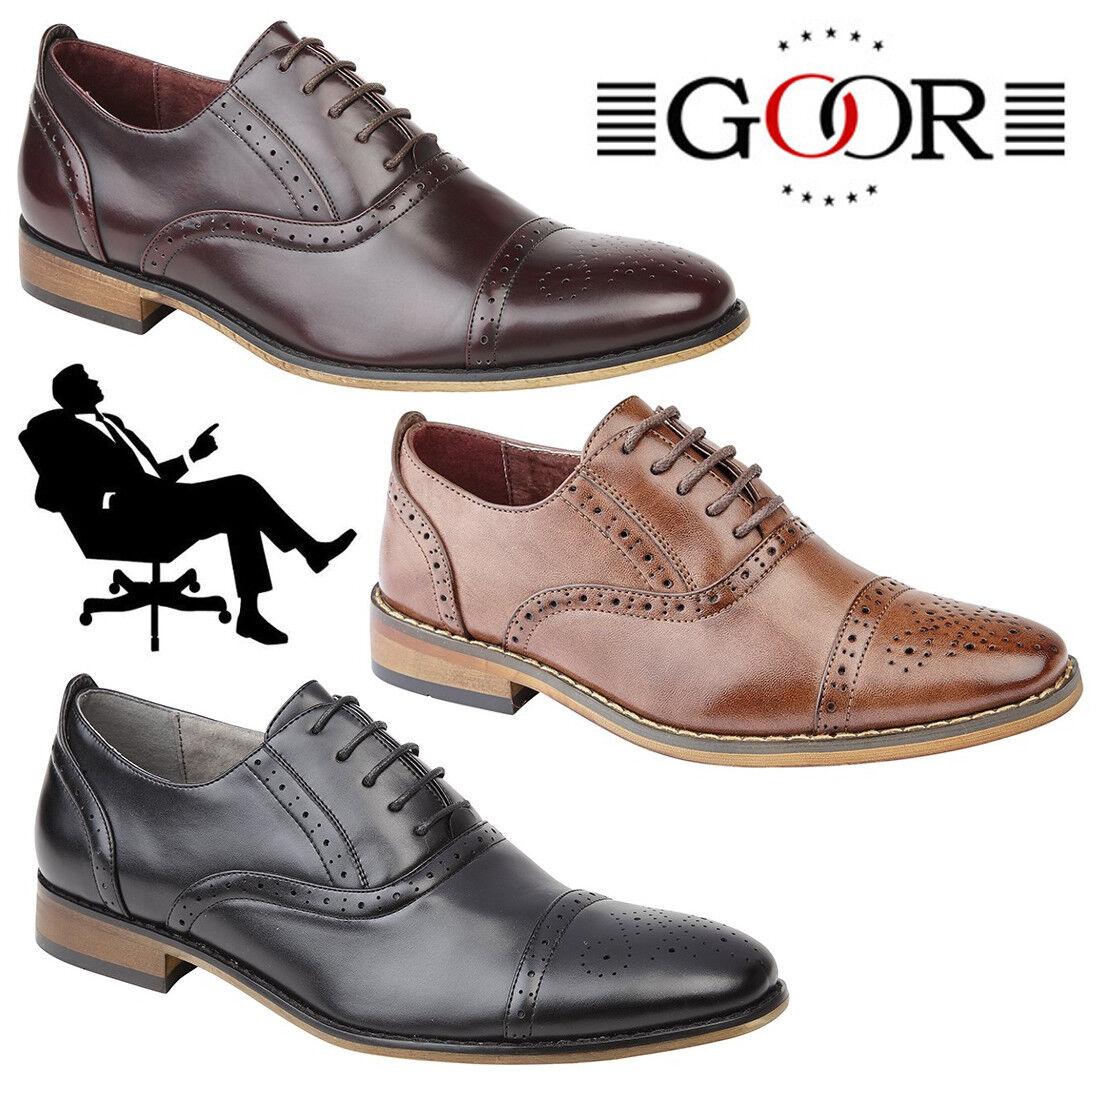 Goor /'Grantham/' Kids Oxford Brogues Boys Smart Formal Back To School Shoes SALE